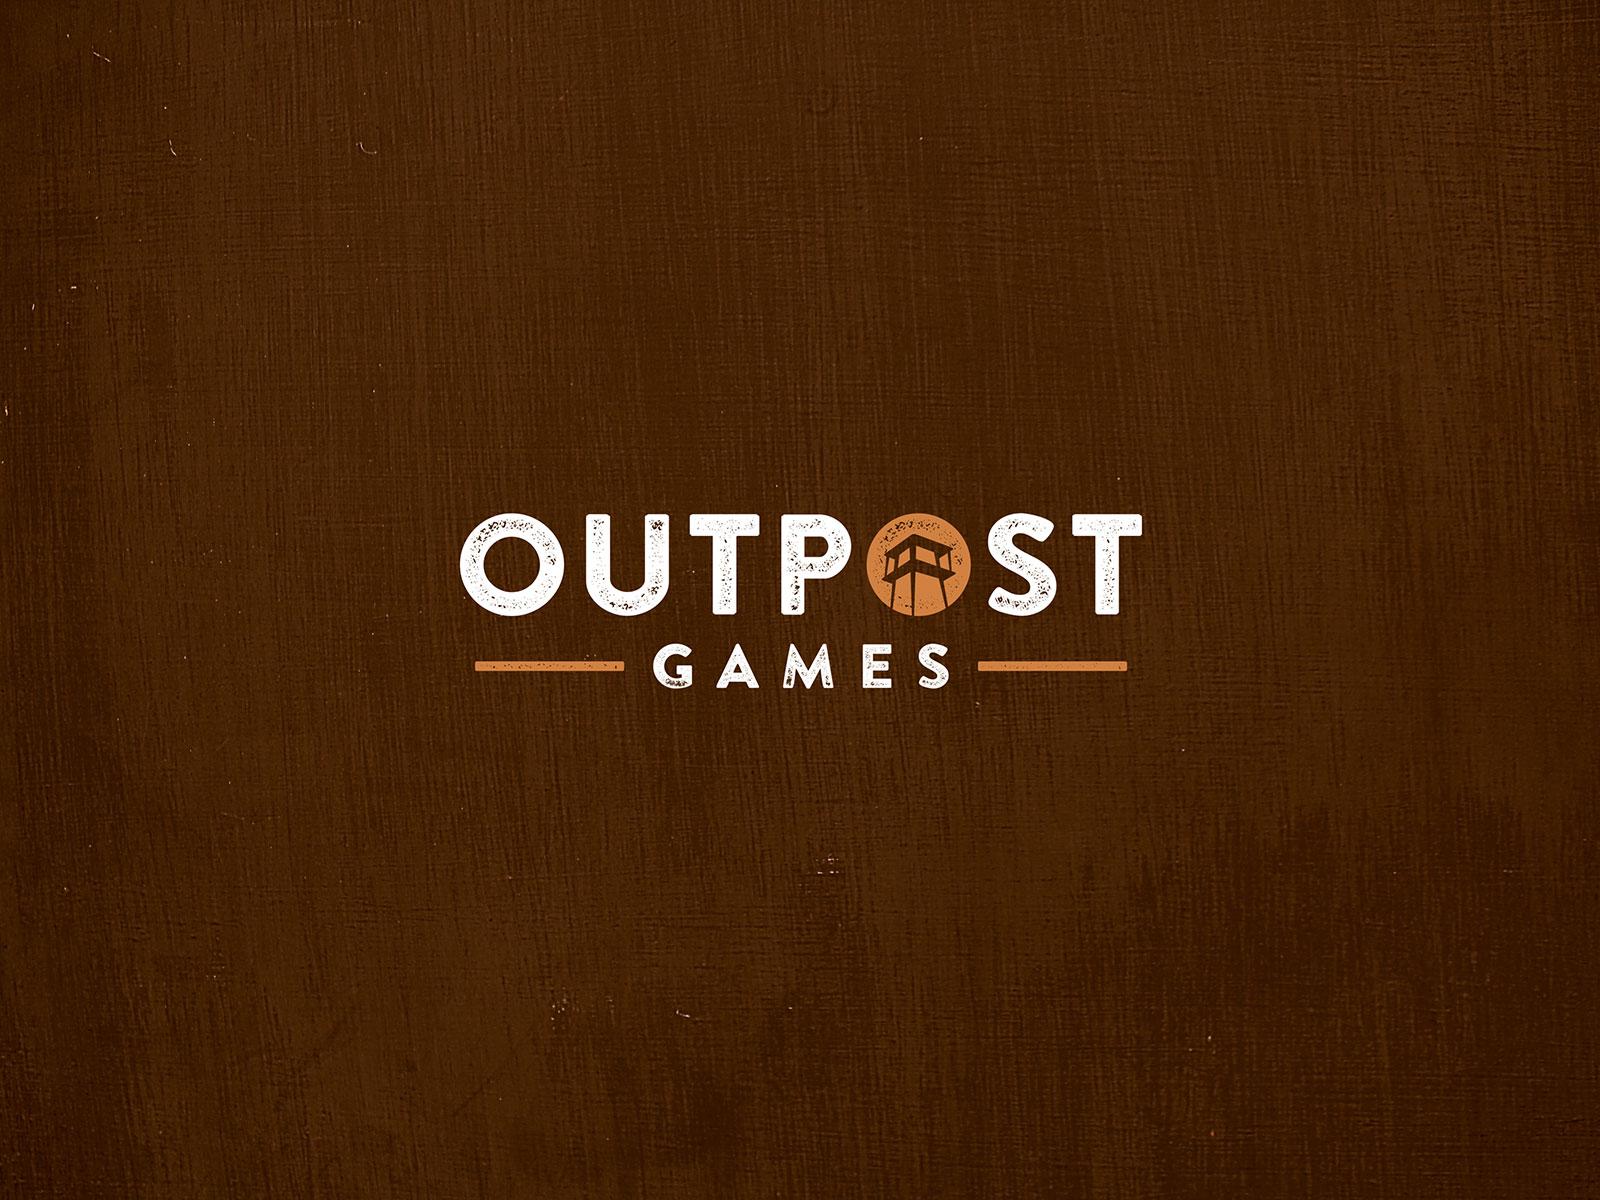 Outpost games logo design1